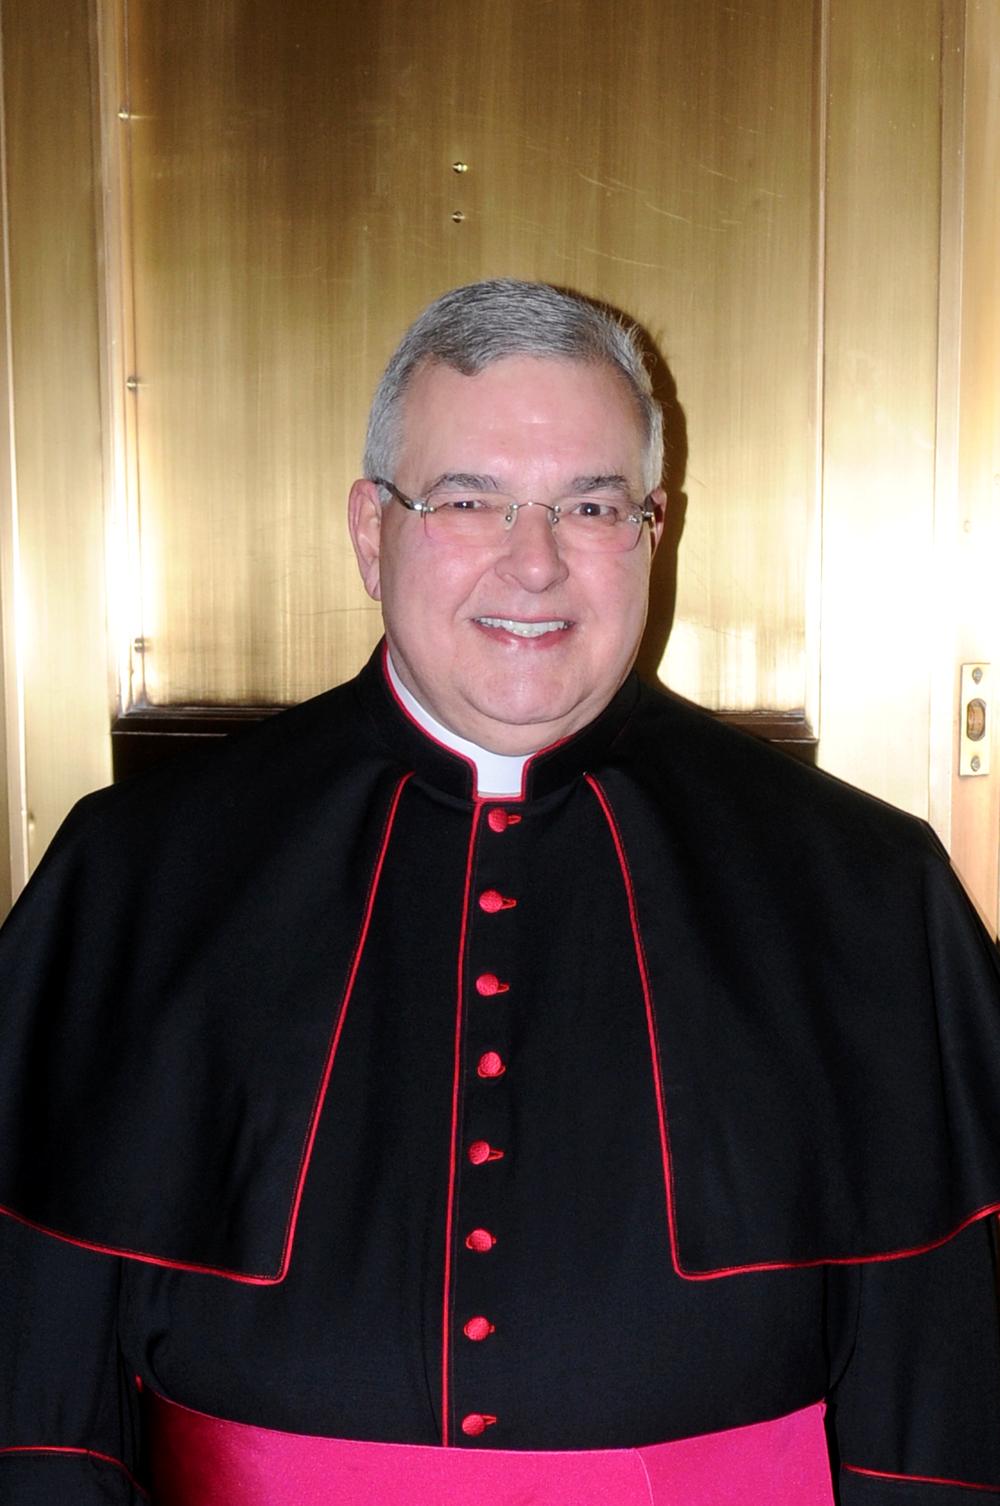 Msgr. Ronald Marino